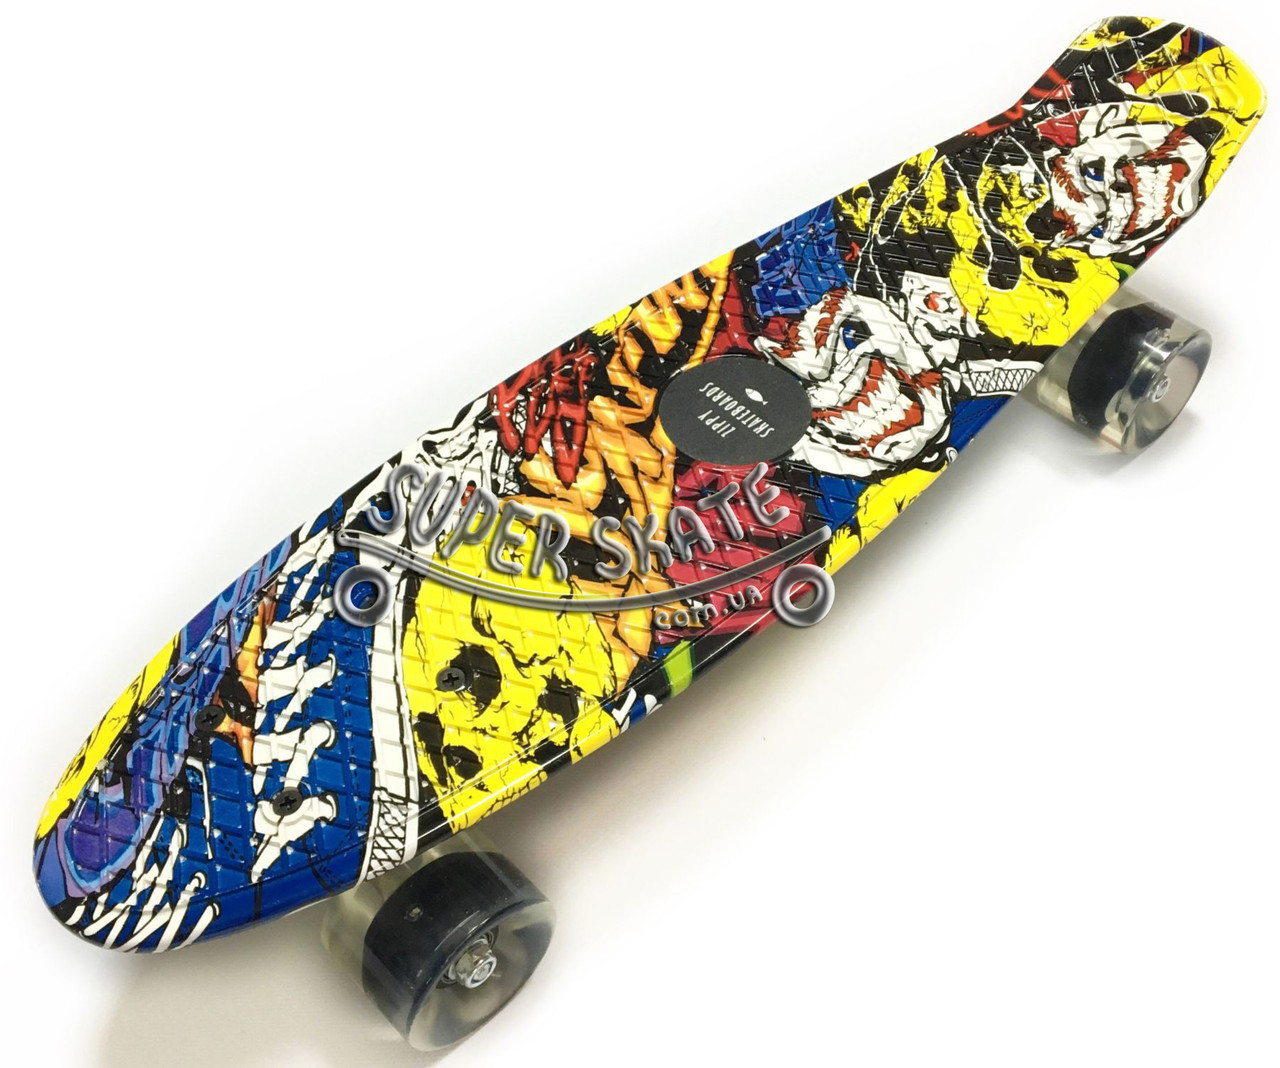 Скейт Пенни борд Penny Print Led 22 Joker - Пенні борд Джокер 54 см